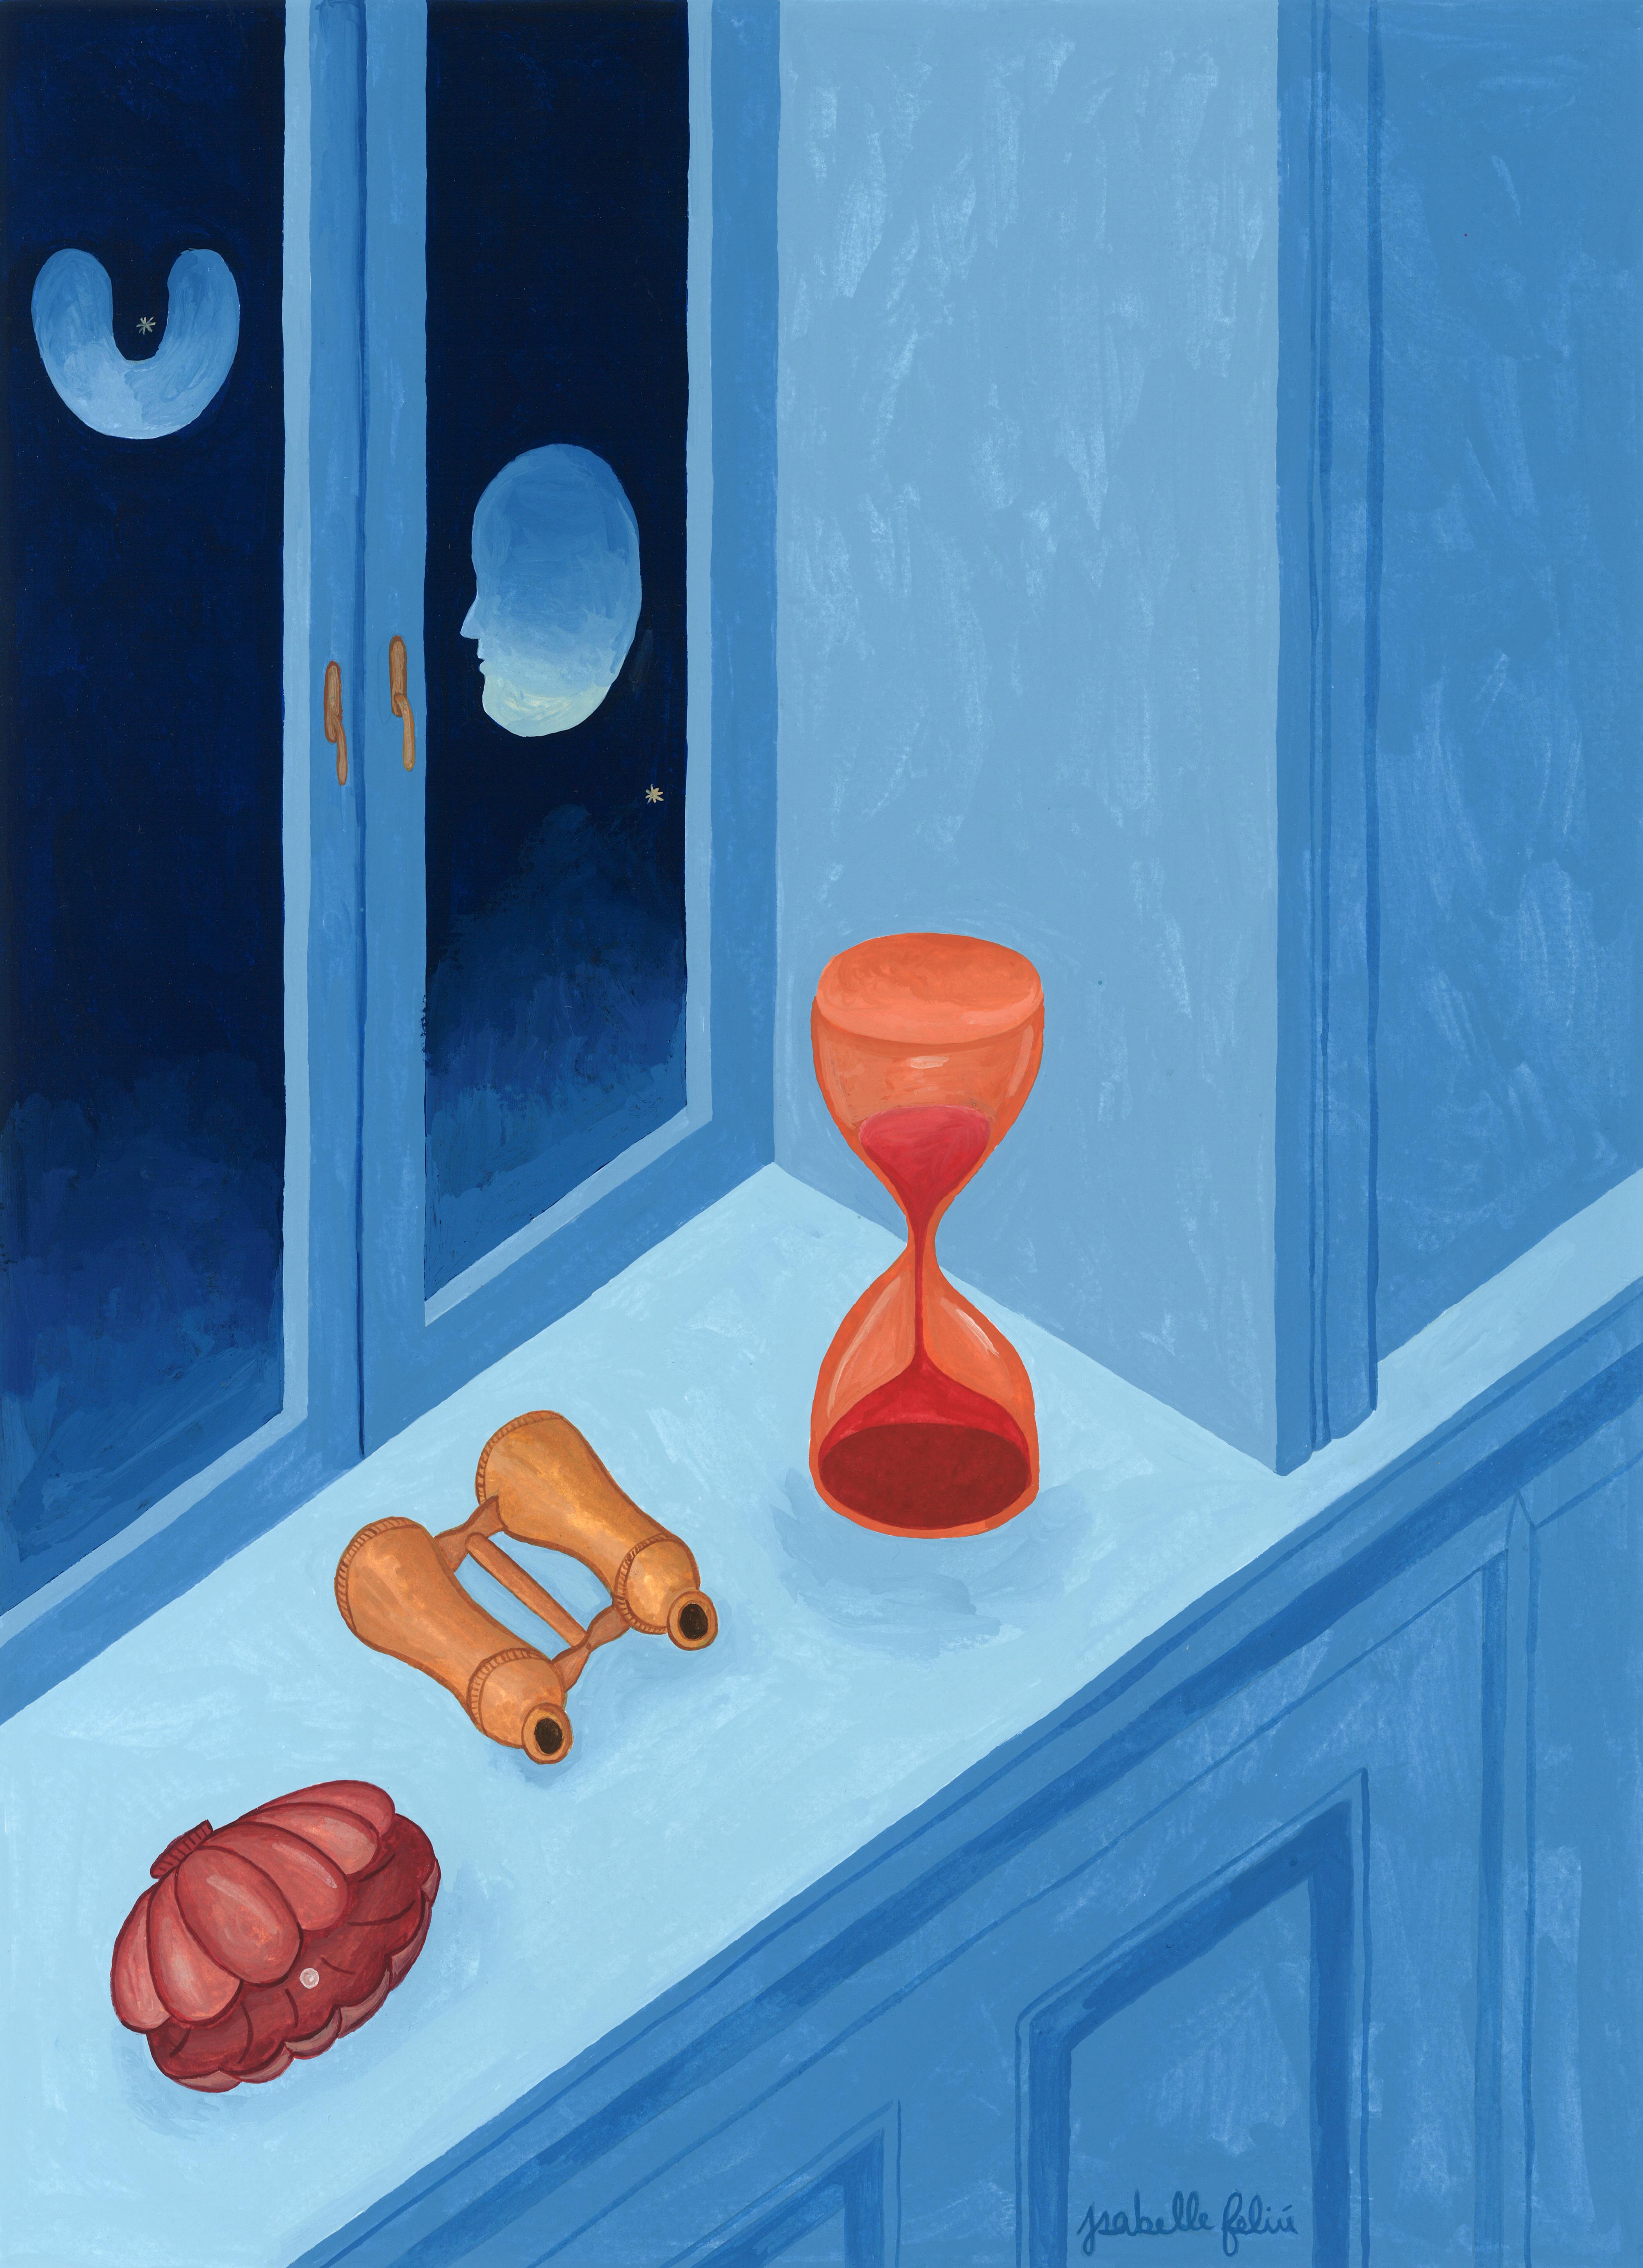 Insomnias by Isabelle Feliu